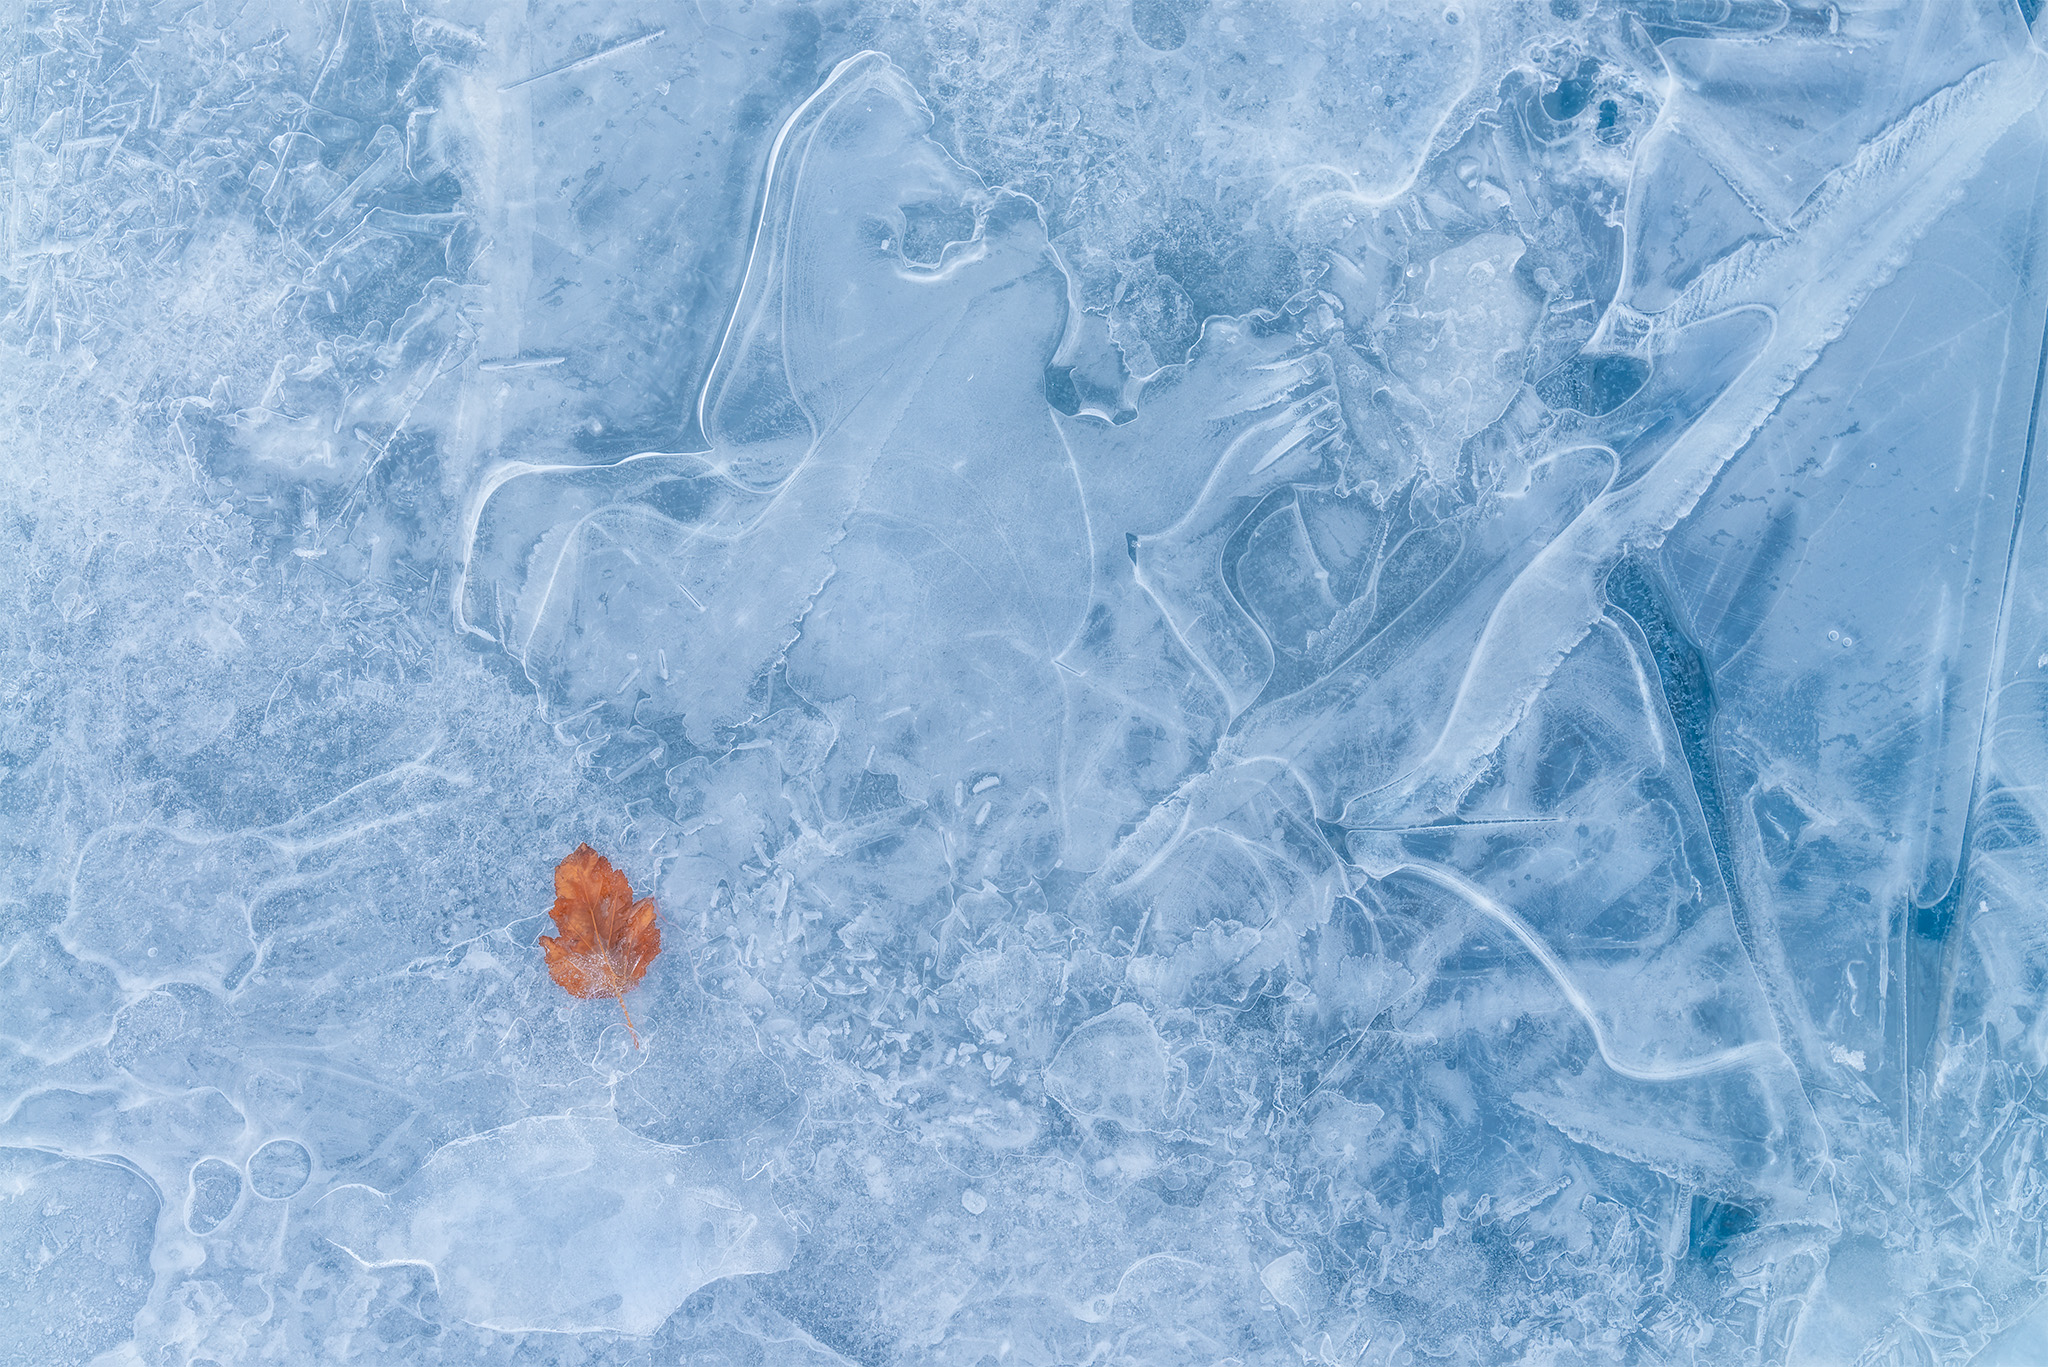 An intimate landscape photograph of a leaf frozen in blue ice in Saskatchewan